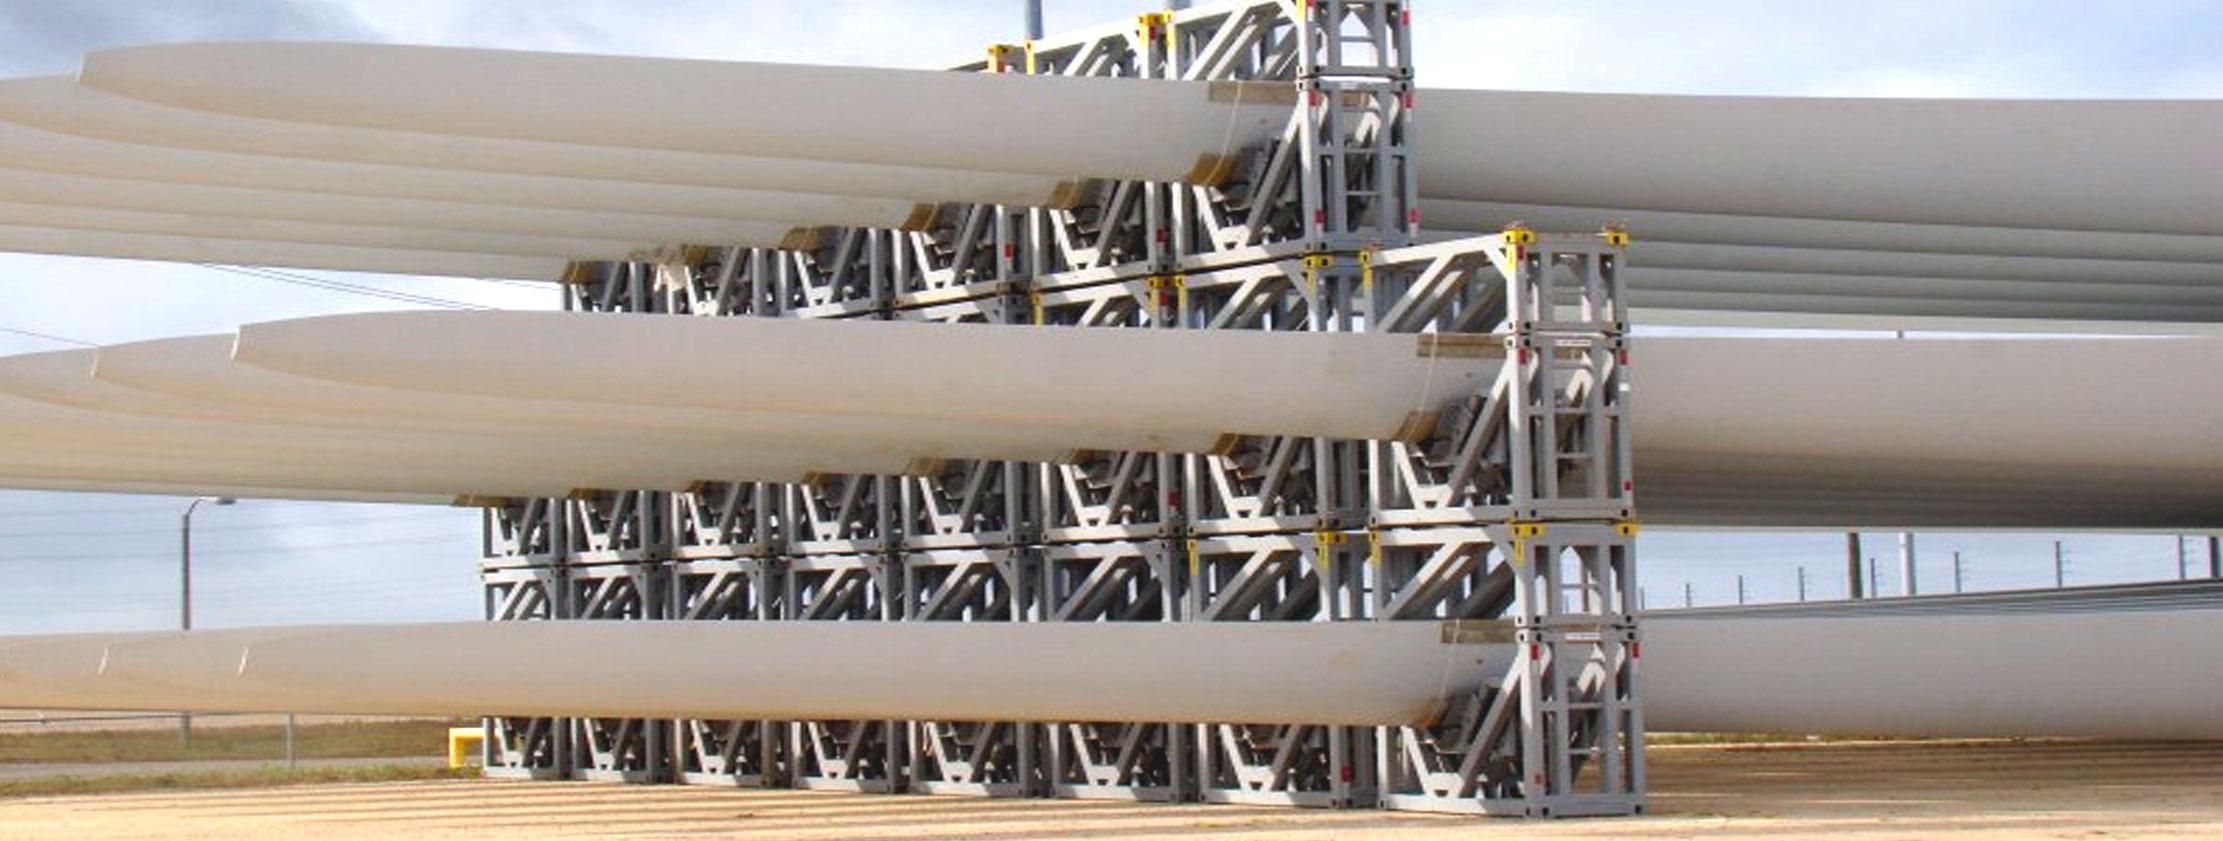 heavy-lift-port-texas.jpg